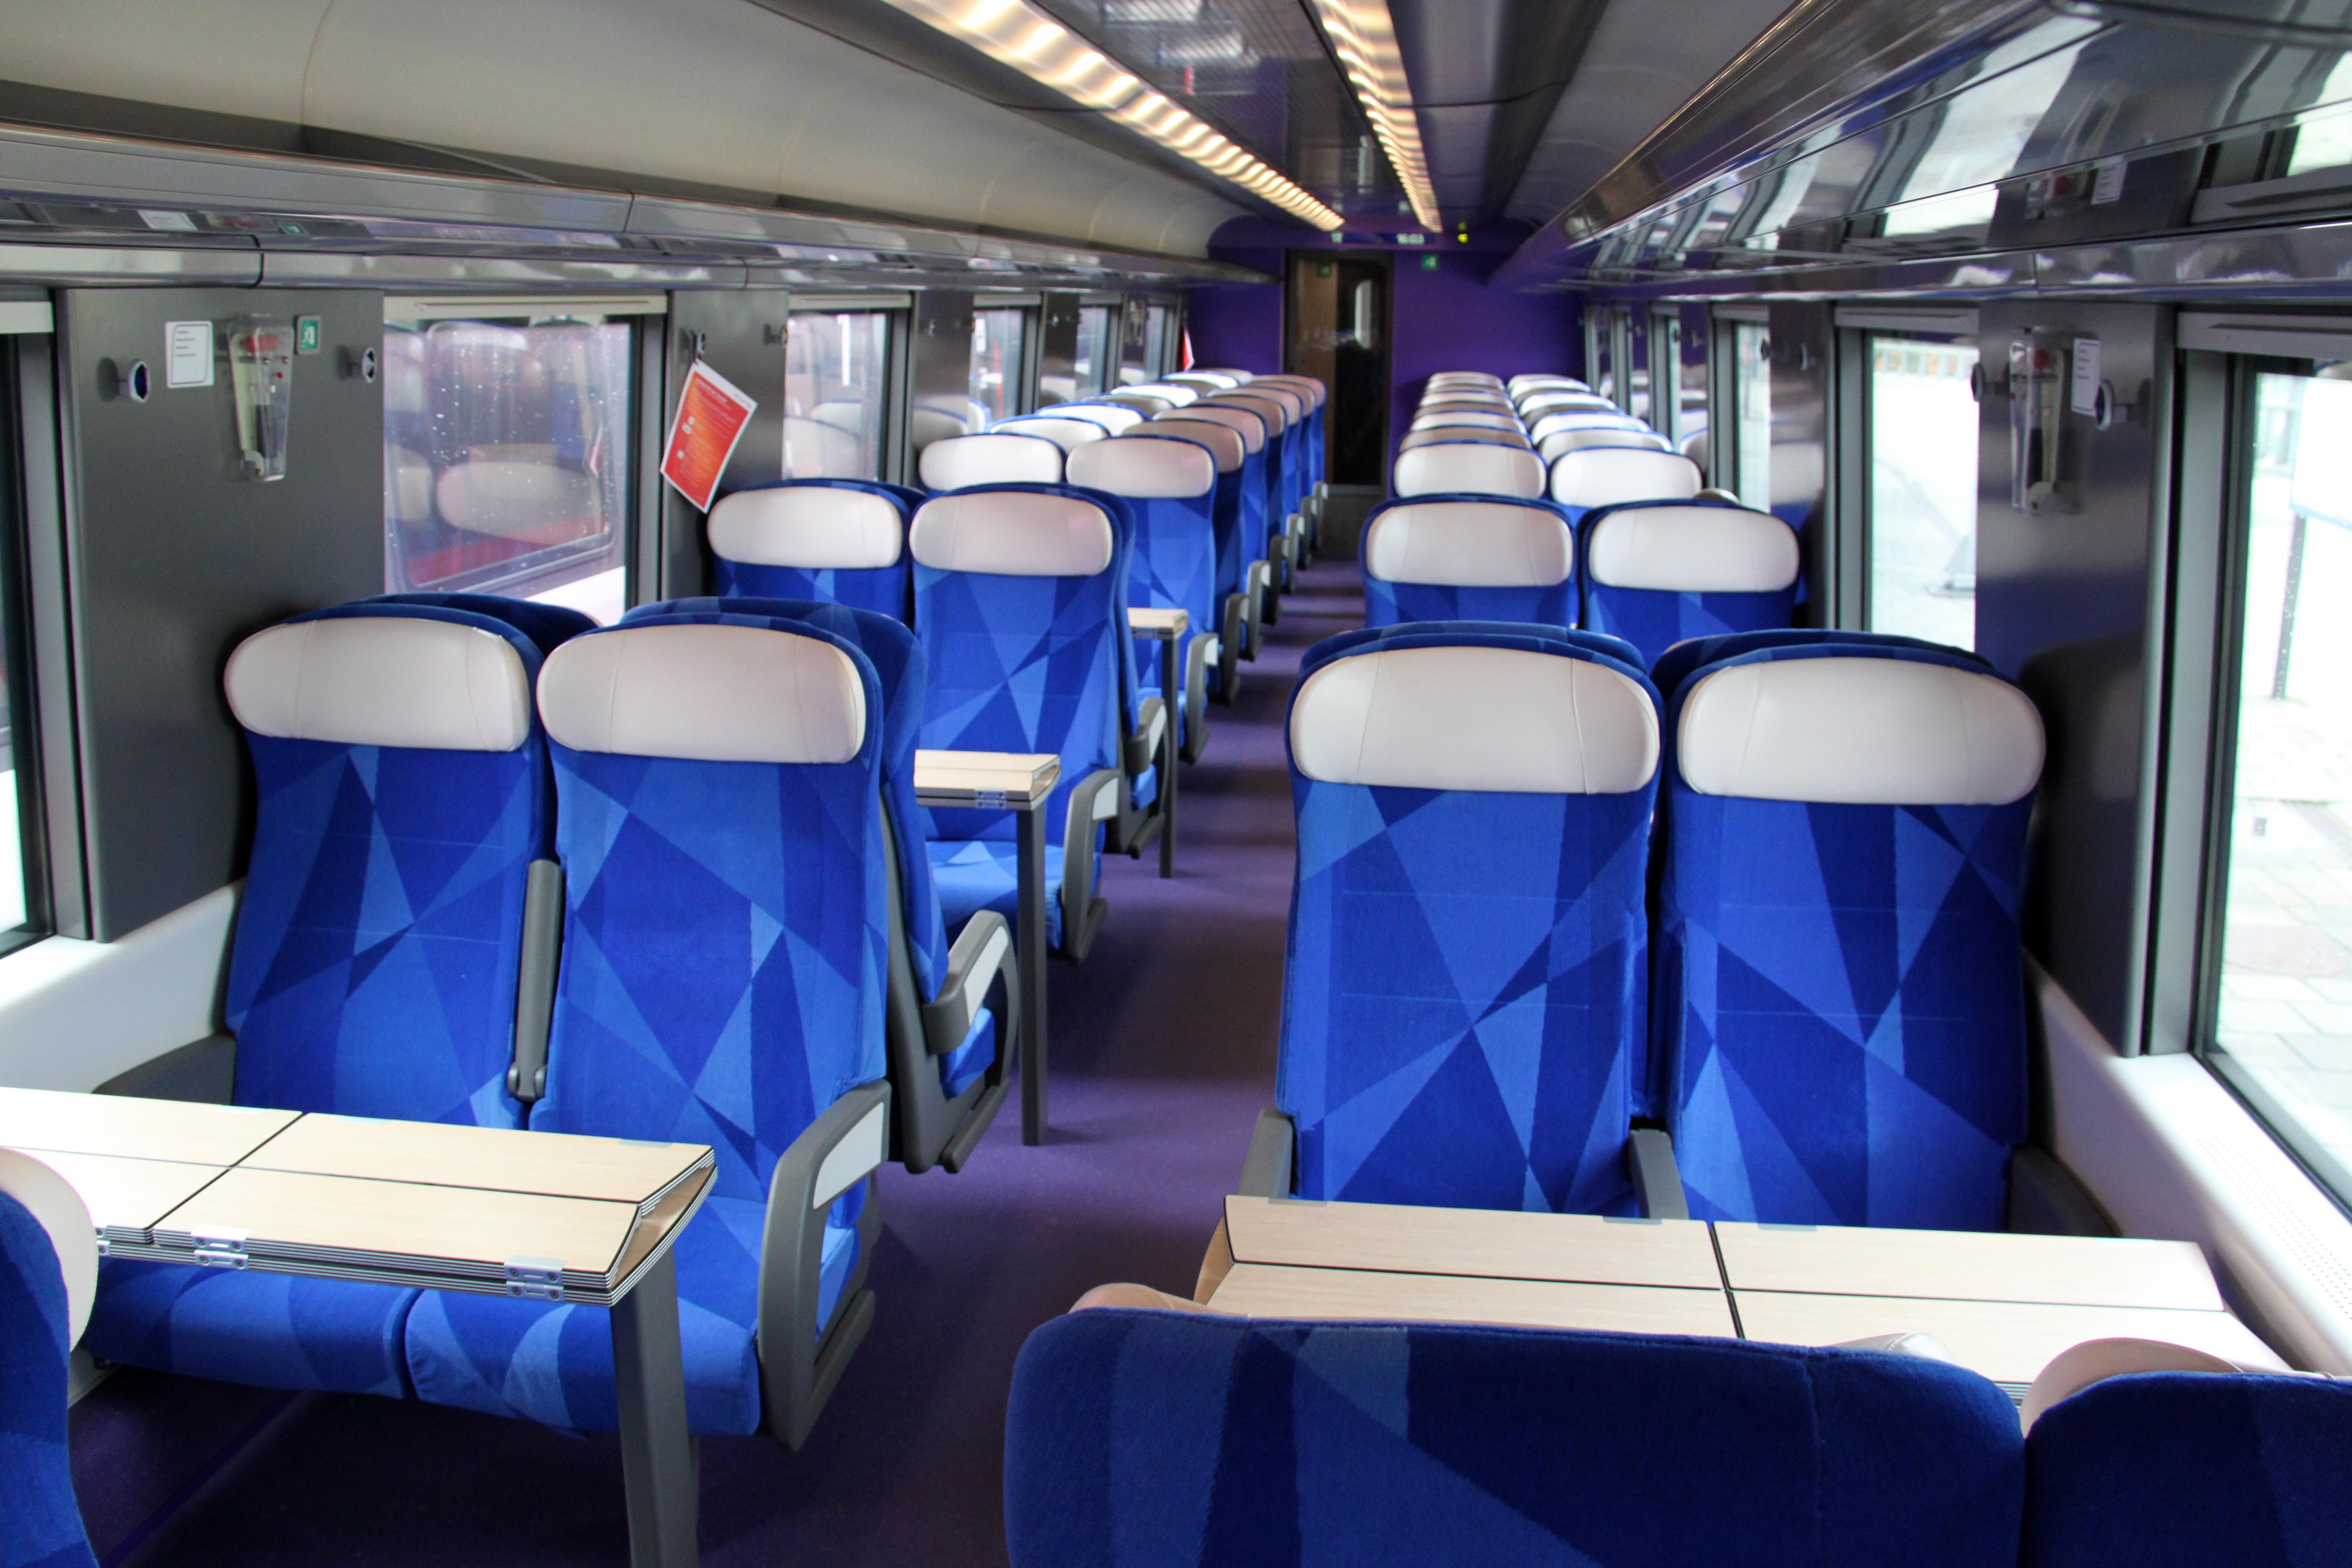 File:V250 Interior 2e klasse 2 2012.jpg - Wikimedia Commons